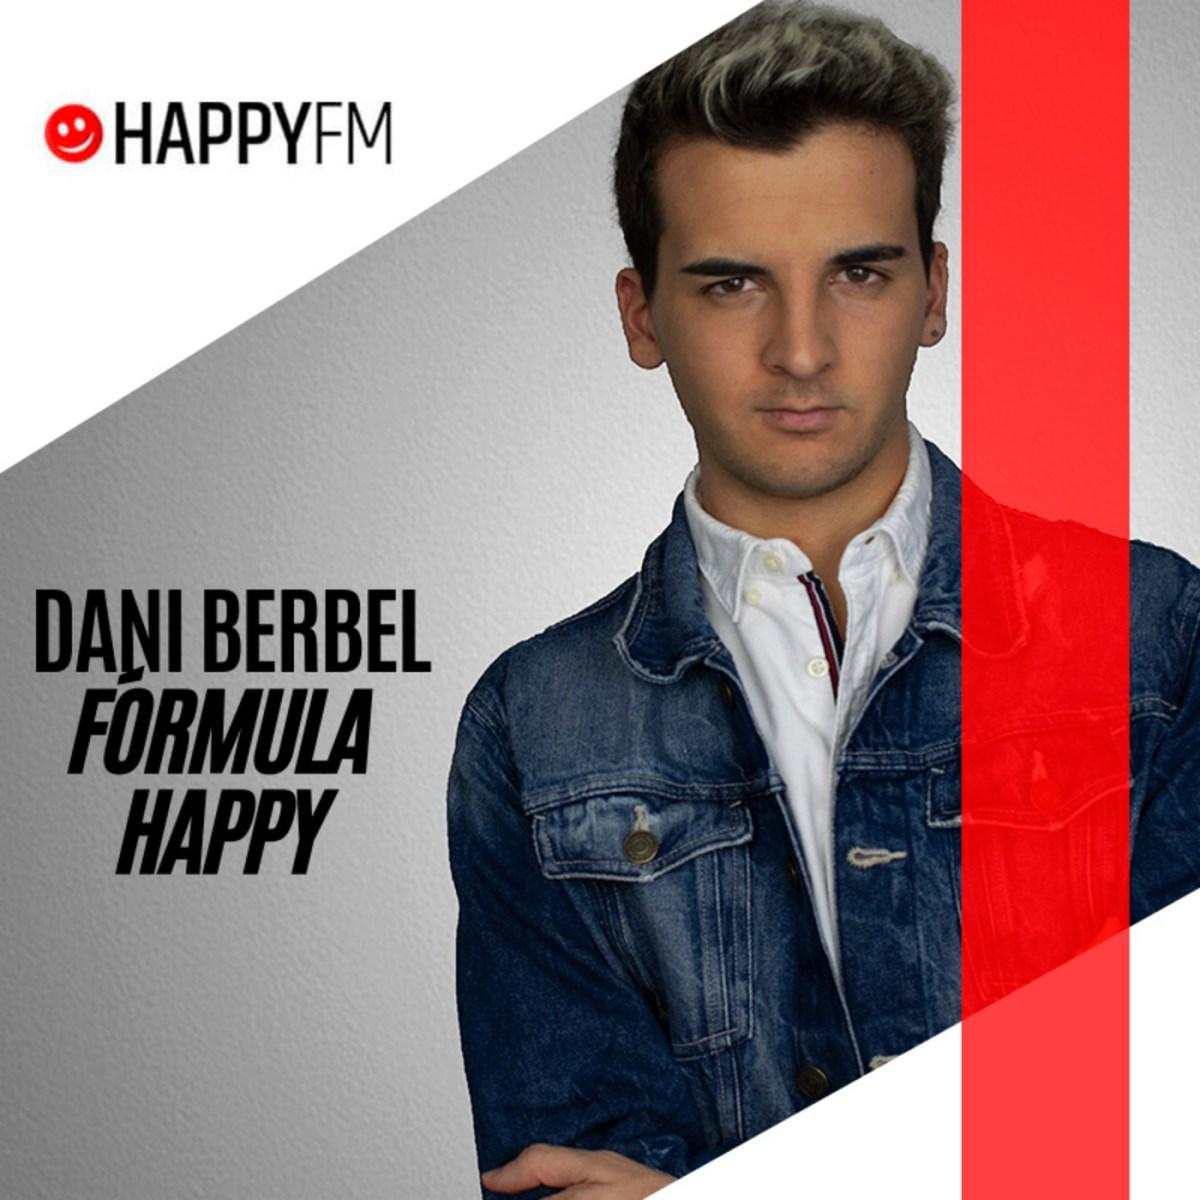 LISTA DE MUSICA ACTUAL 2020 CON DANI BERBEL // HAP